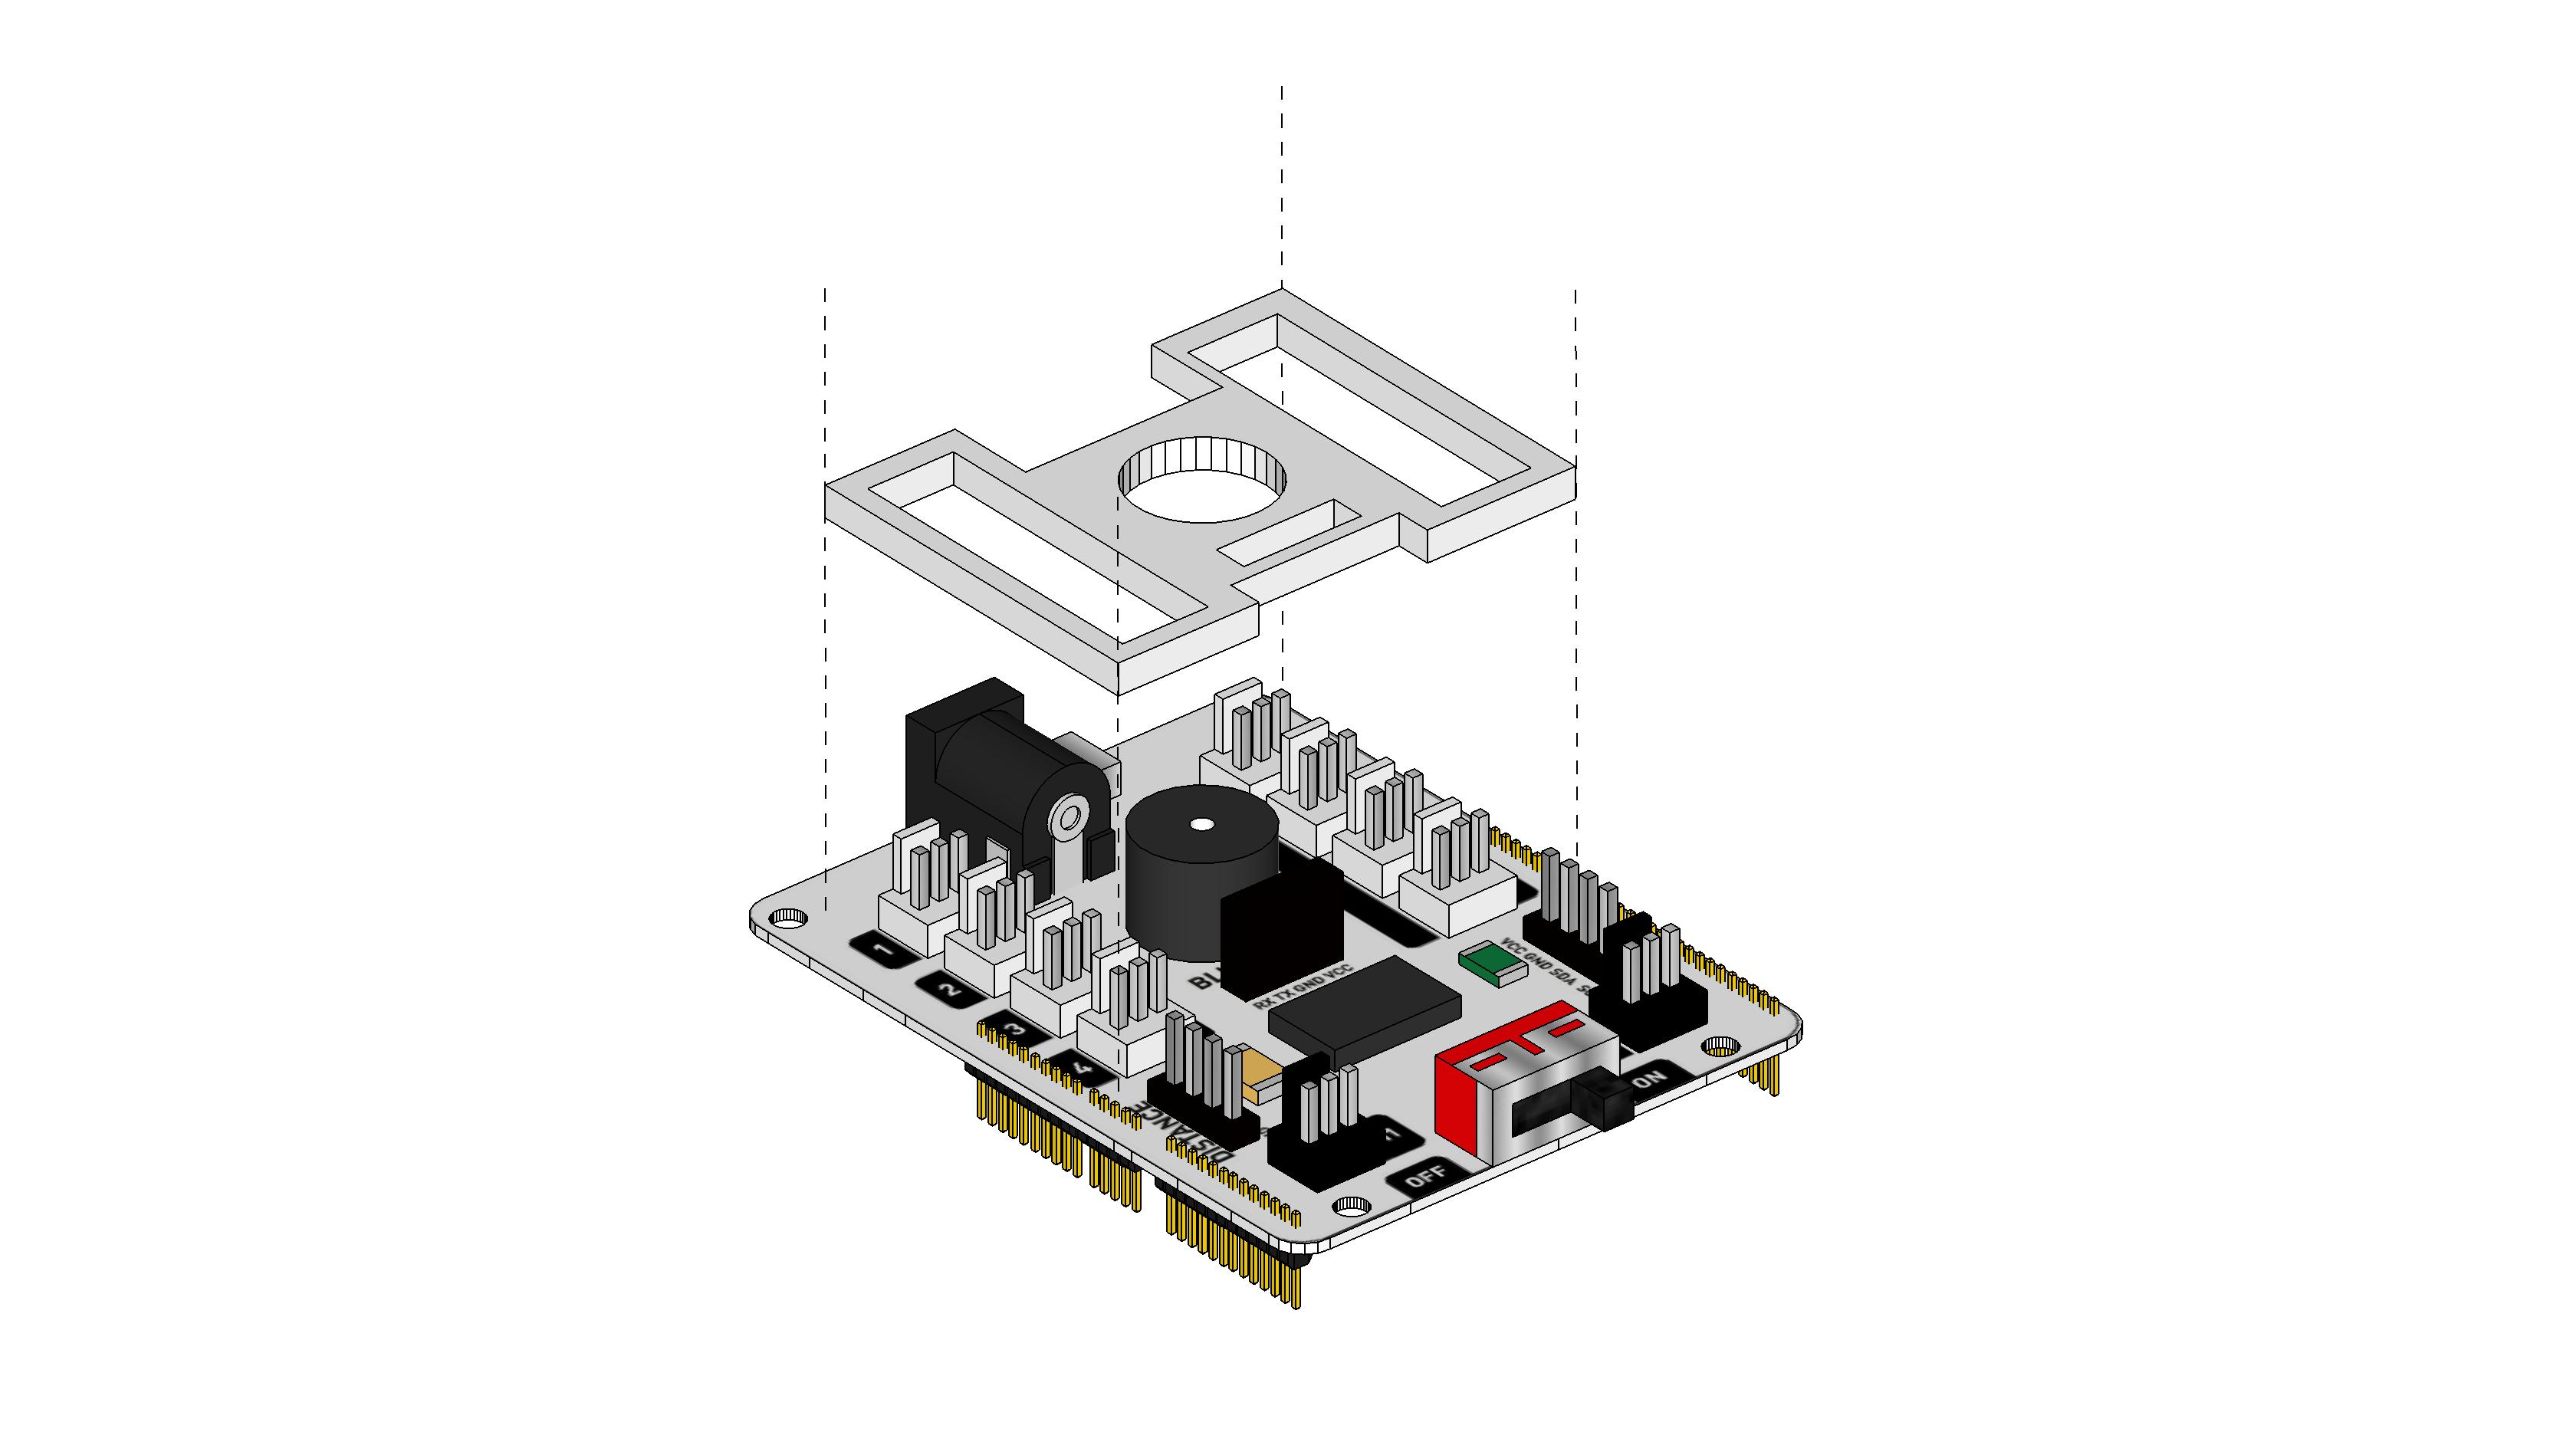 LOFI_Robot_Rover_assembly (15)